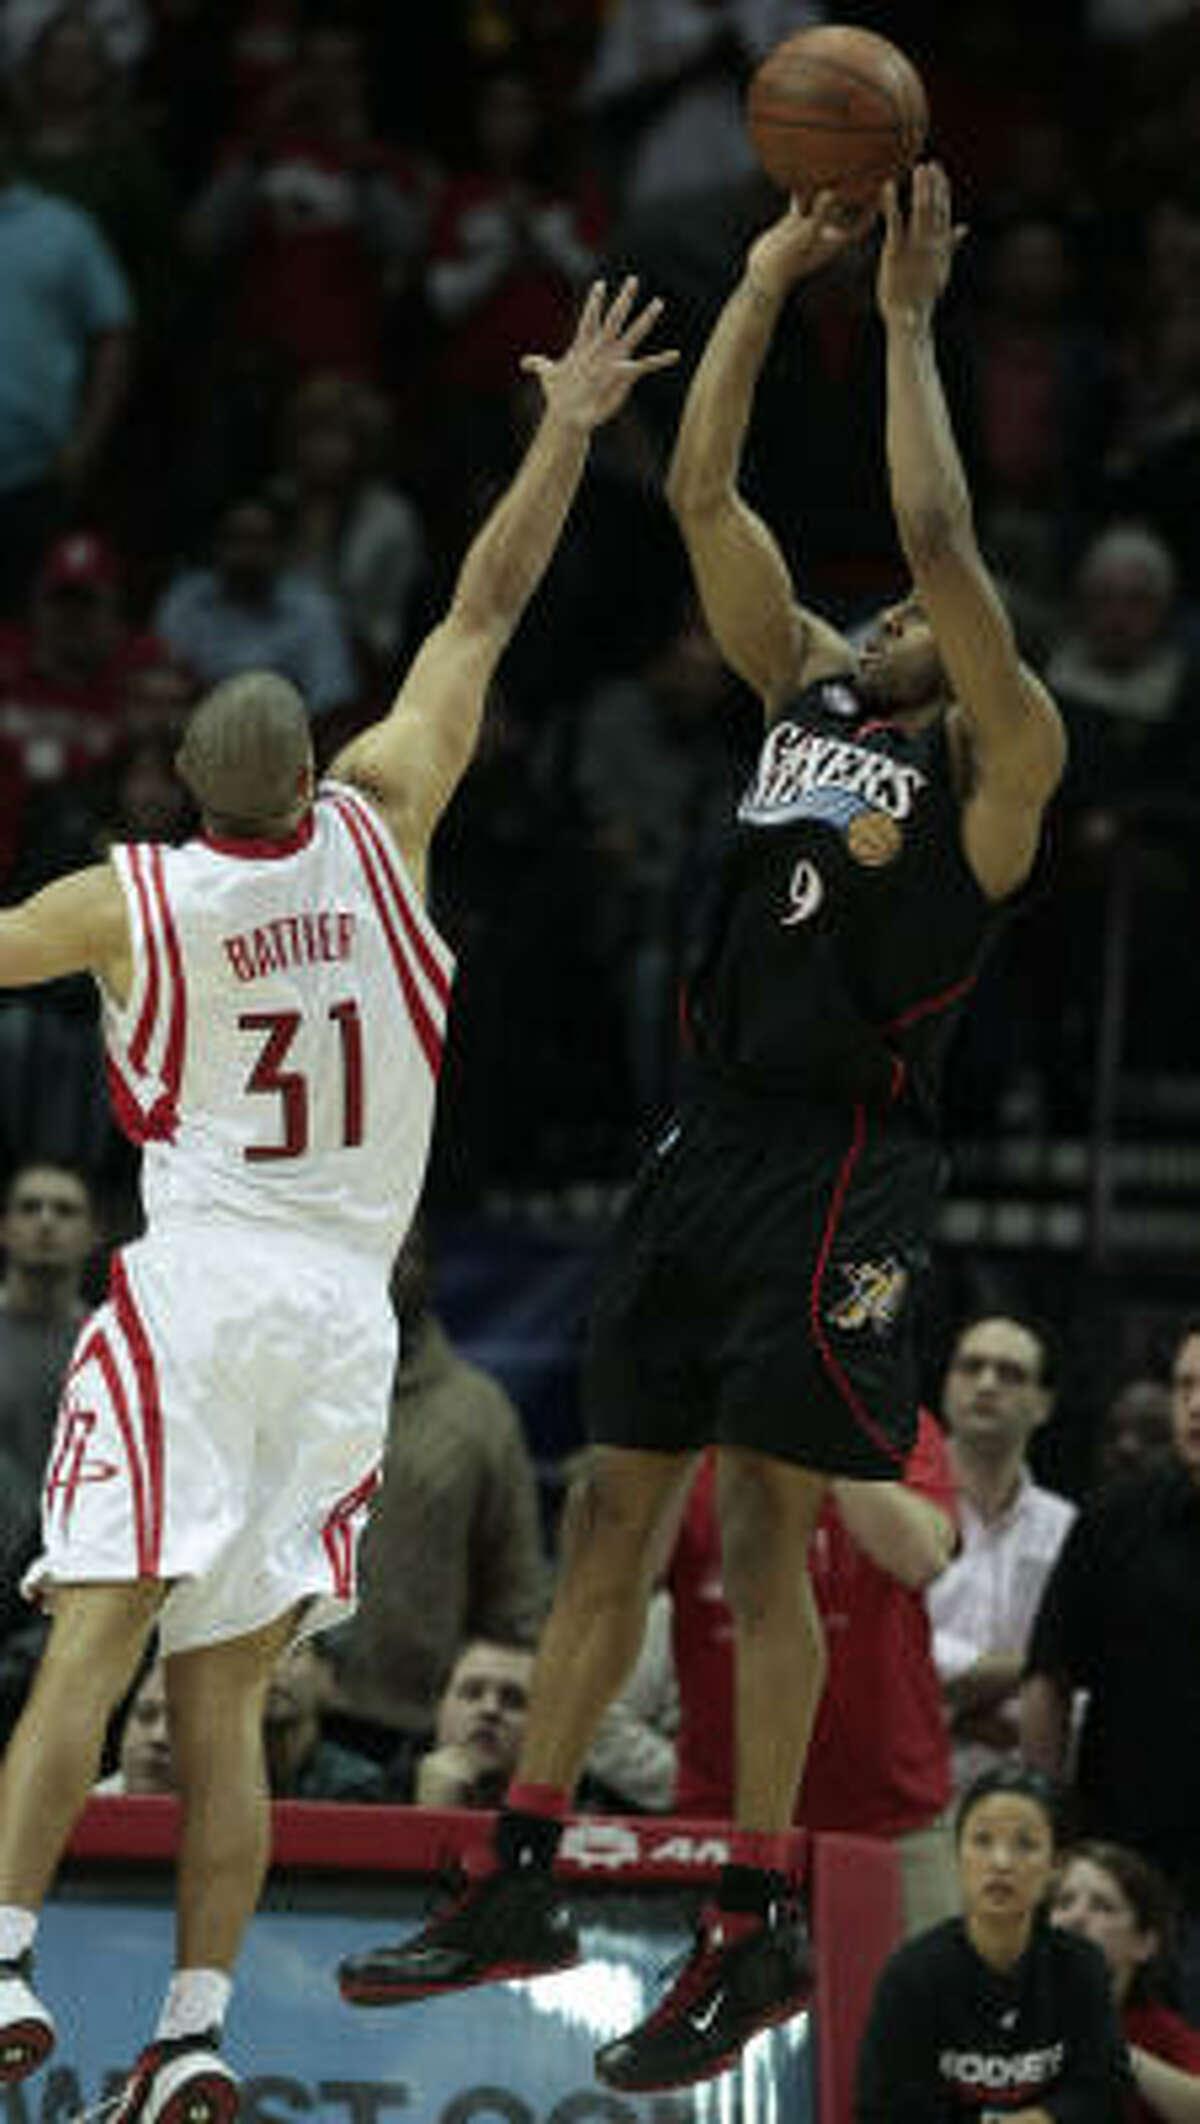 Shane Battier, left, defends 76ers forward Andre Iguodala during last seconds of the fourth quarter.